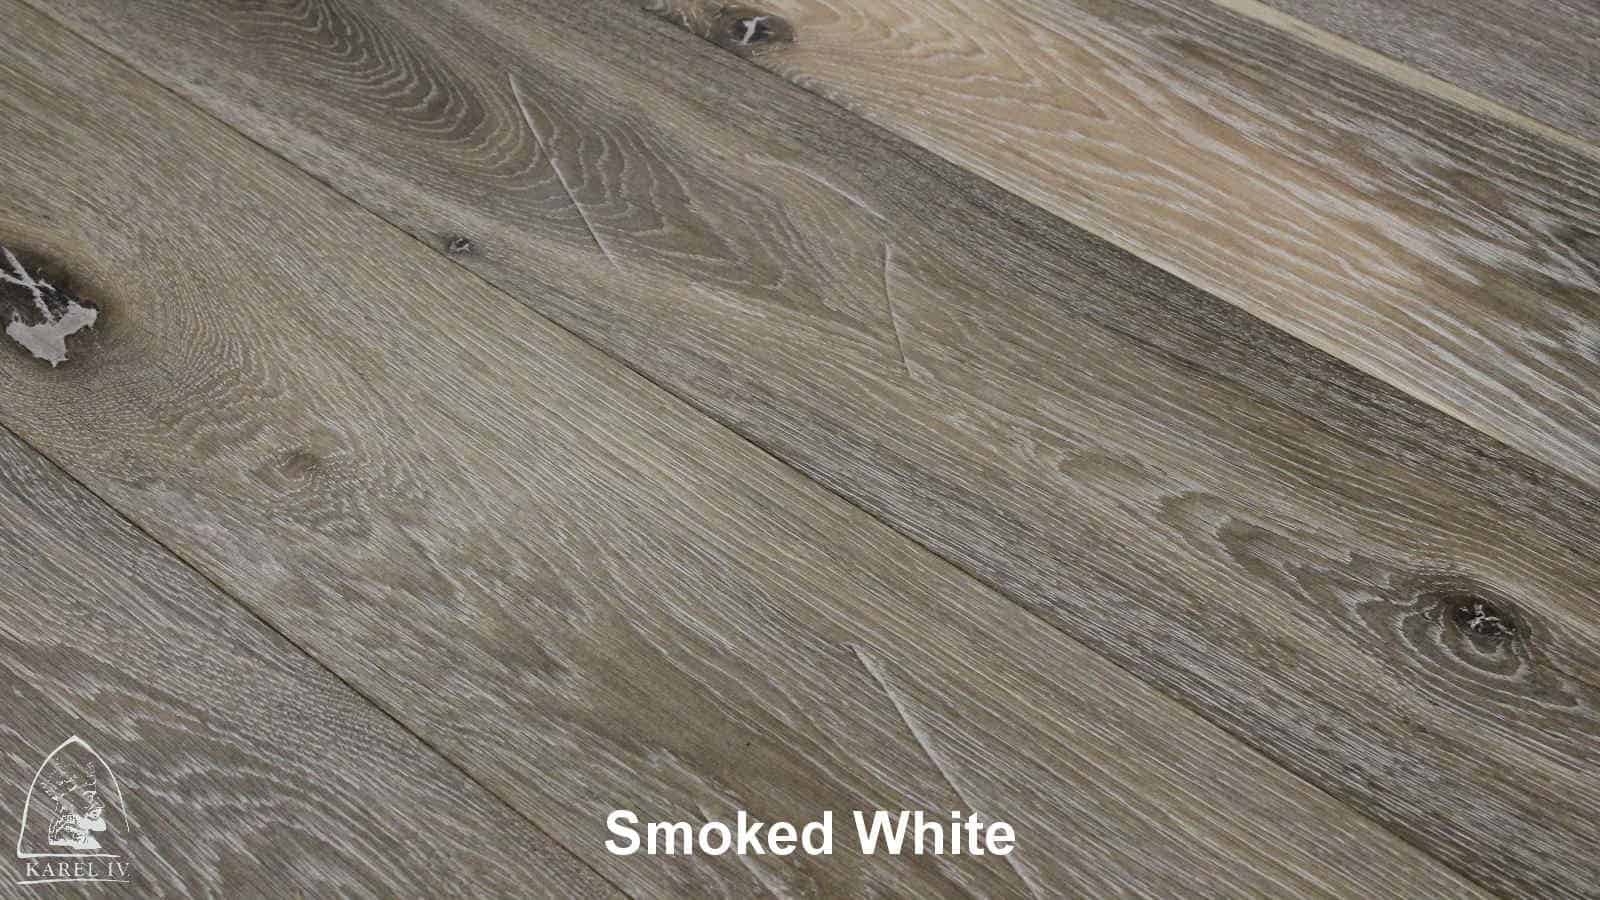 Kolekcja: ESCO Karel IV, Kolor: Smoked White